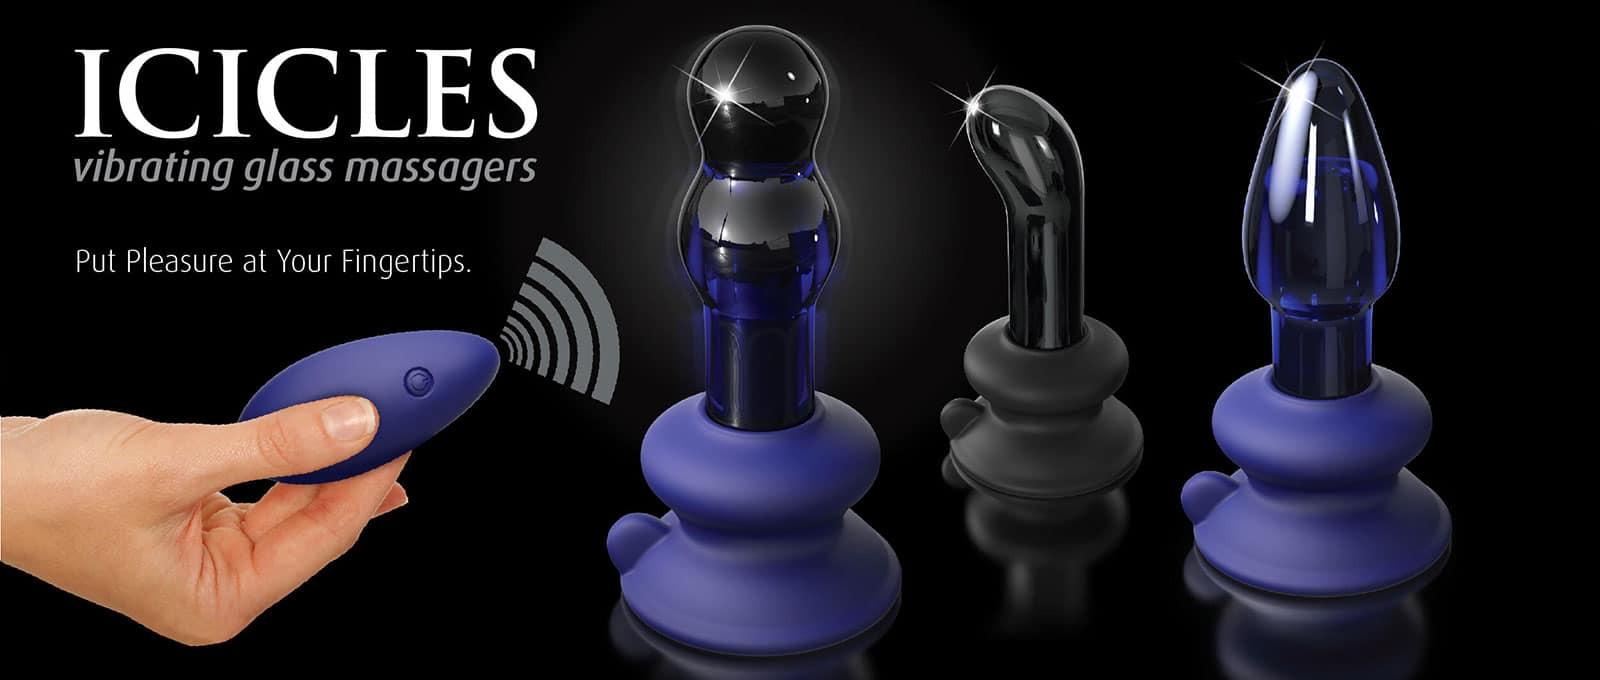 vibrating_icicles_1600x680